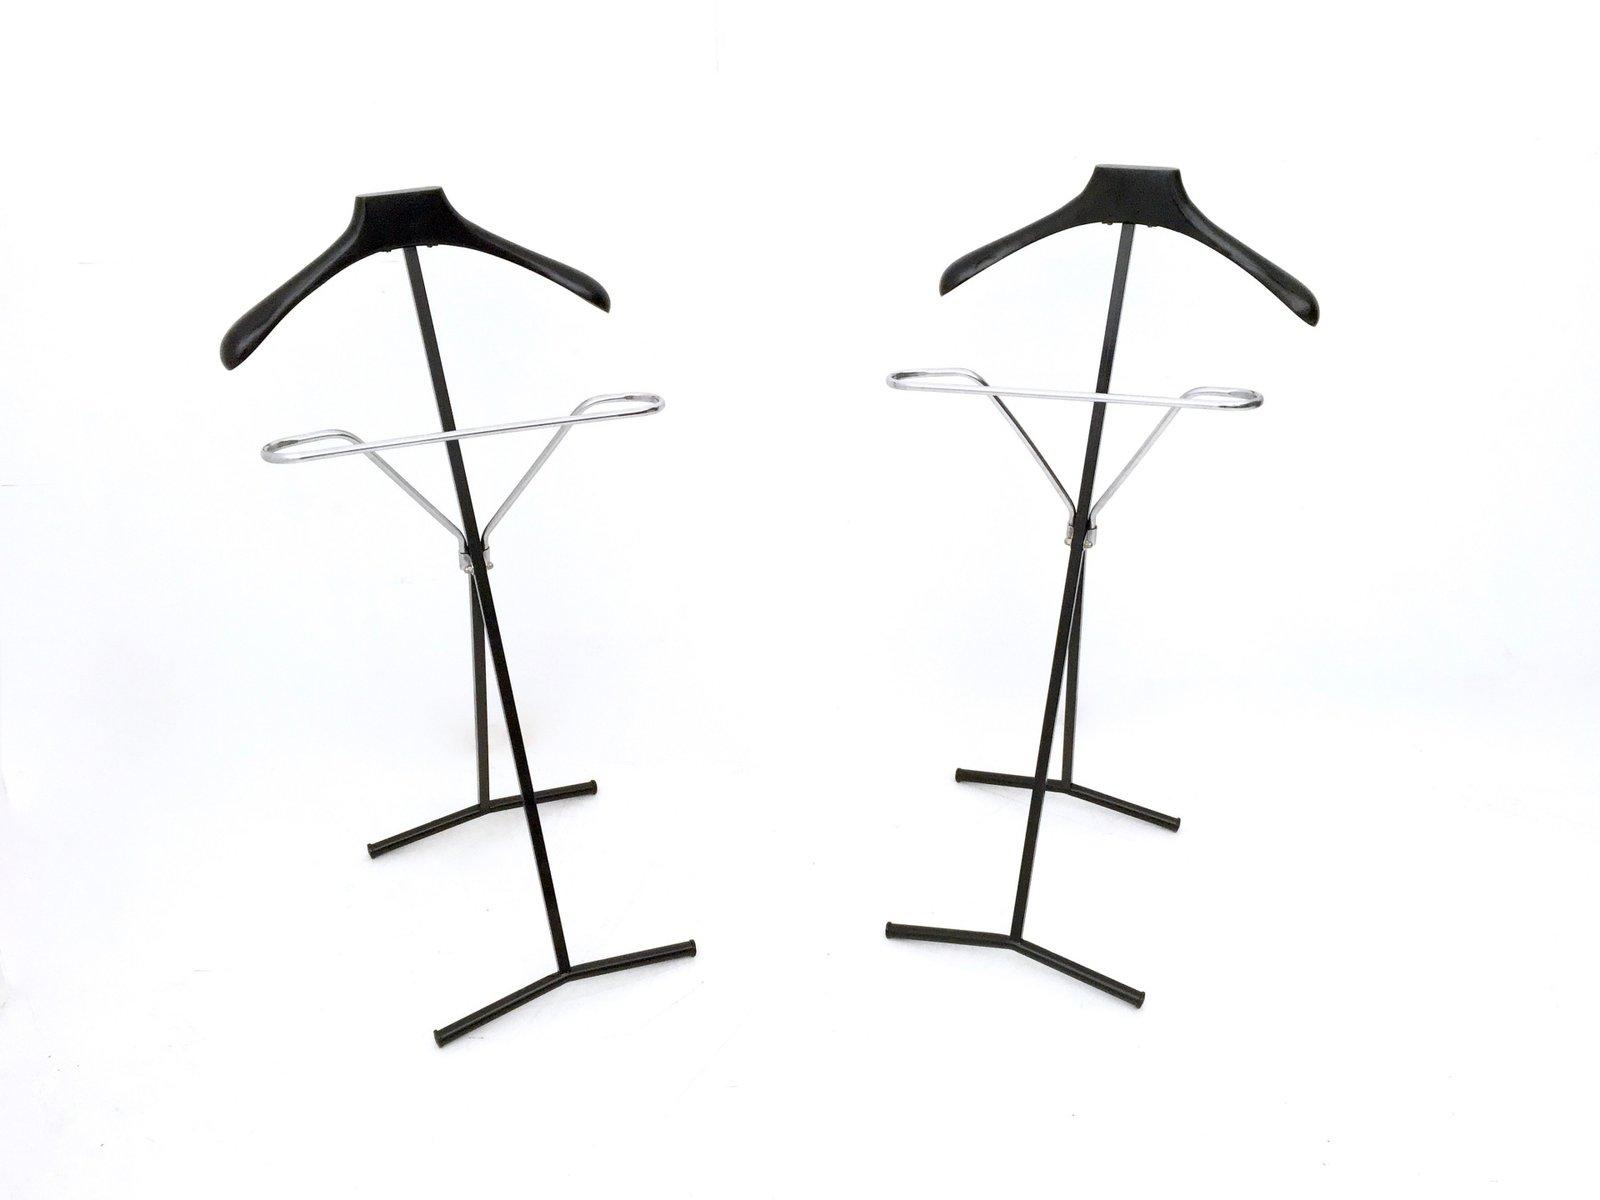 kleiderst nder aus ebonisierter buche metall 1950er. Black Bedroom Furniture Sets. Home Design Ideas